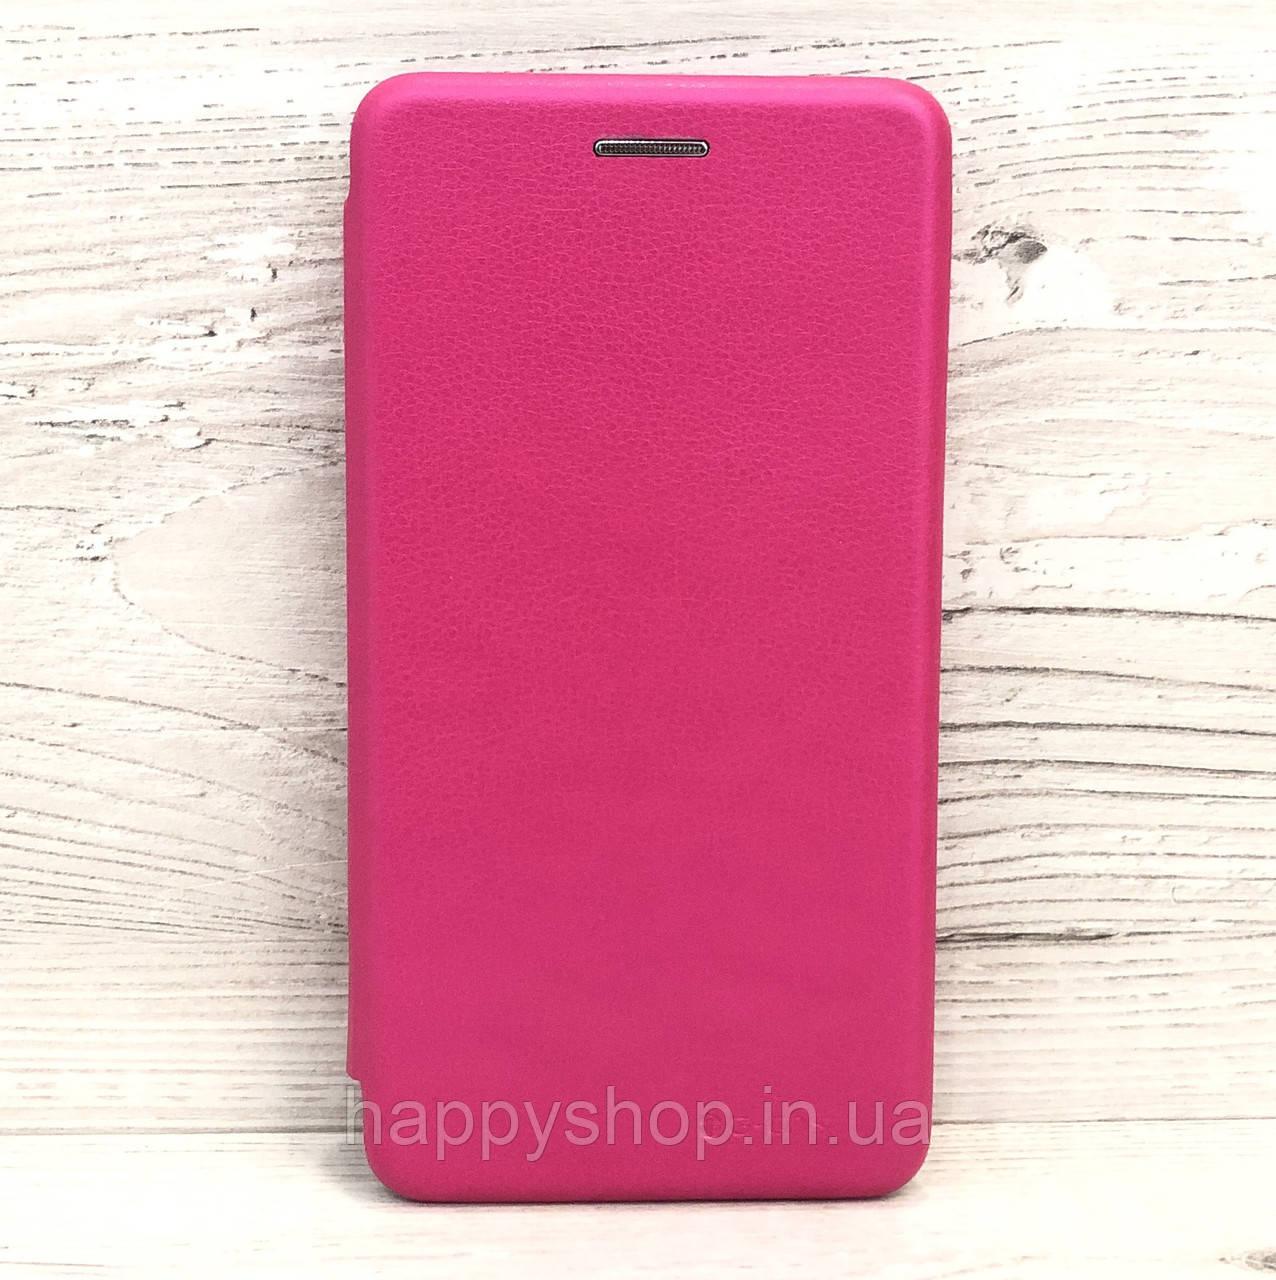 Чехол-книжка G-Case для Samsung Galaxy A8 Plus 2018 (A730) Розовый